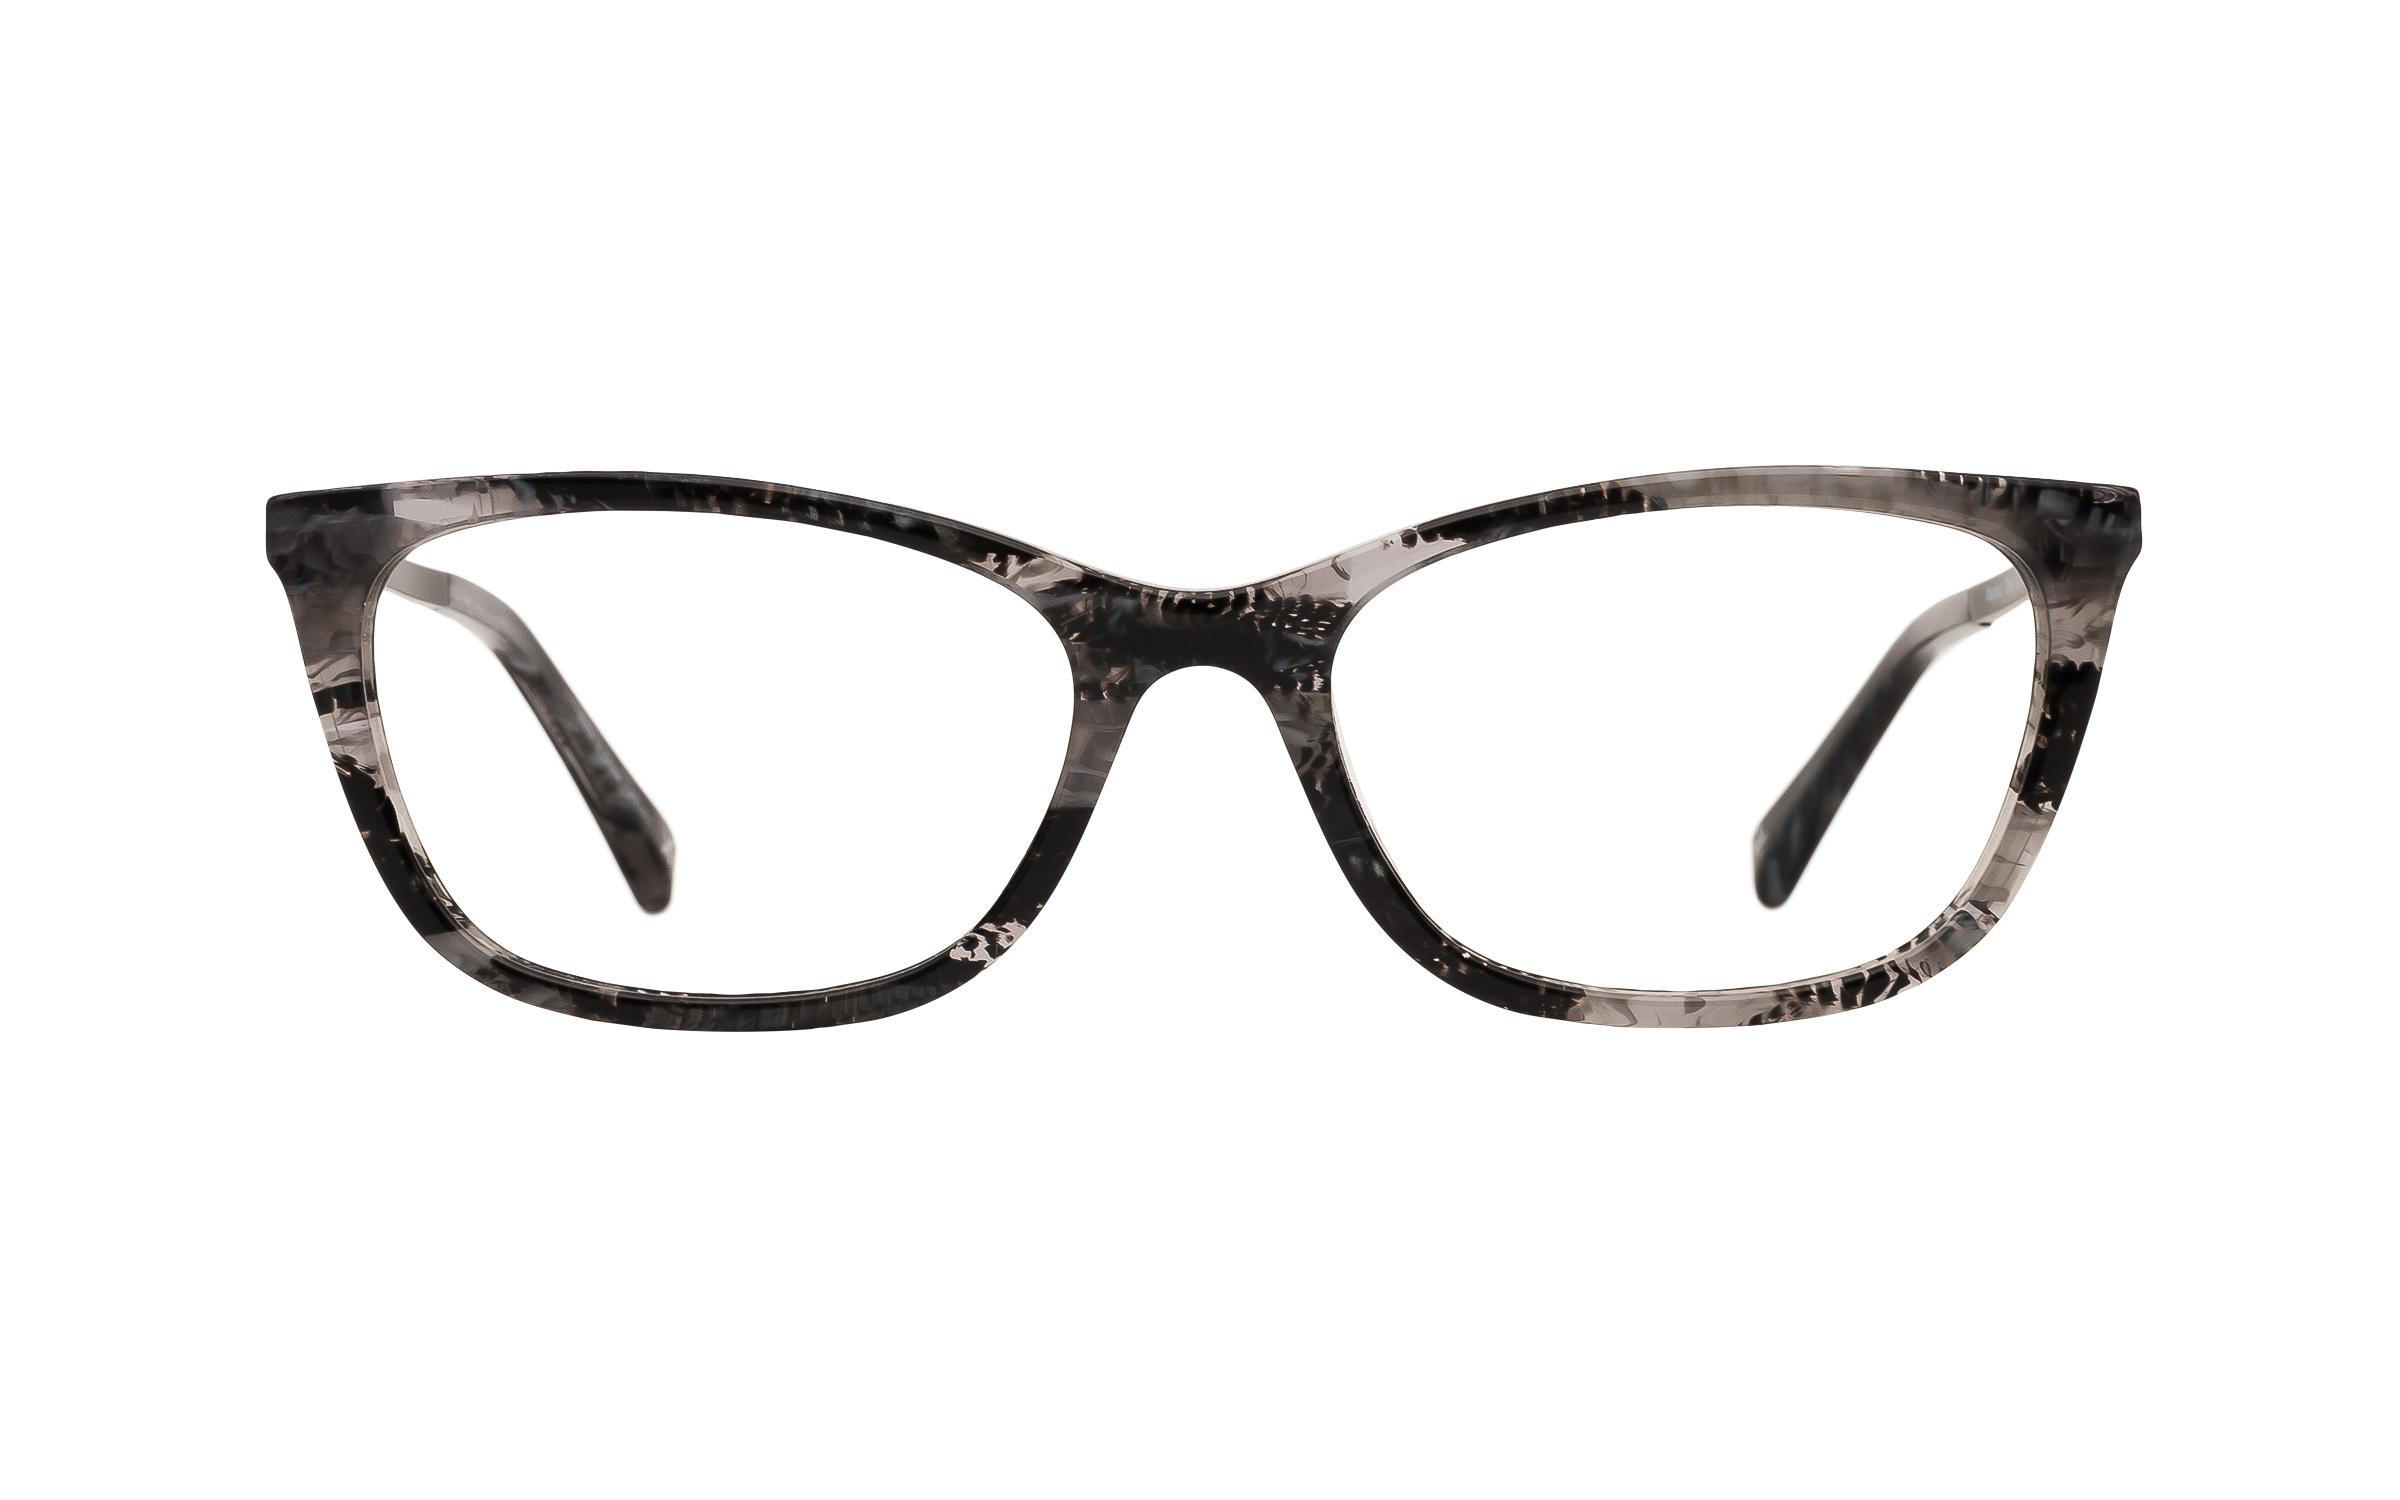 Derek Cardigan Women's Glasses D-Frame Grey Online Clearly